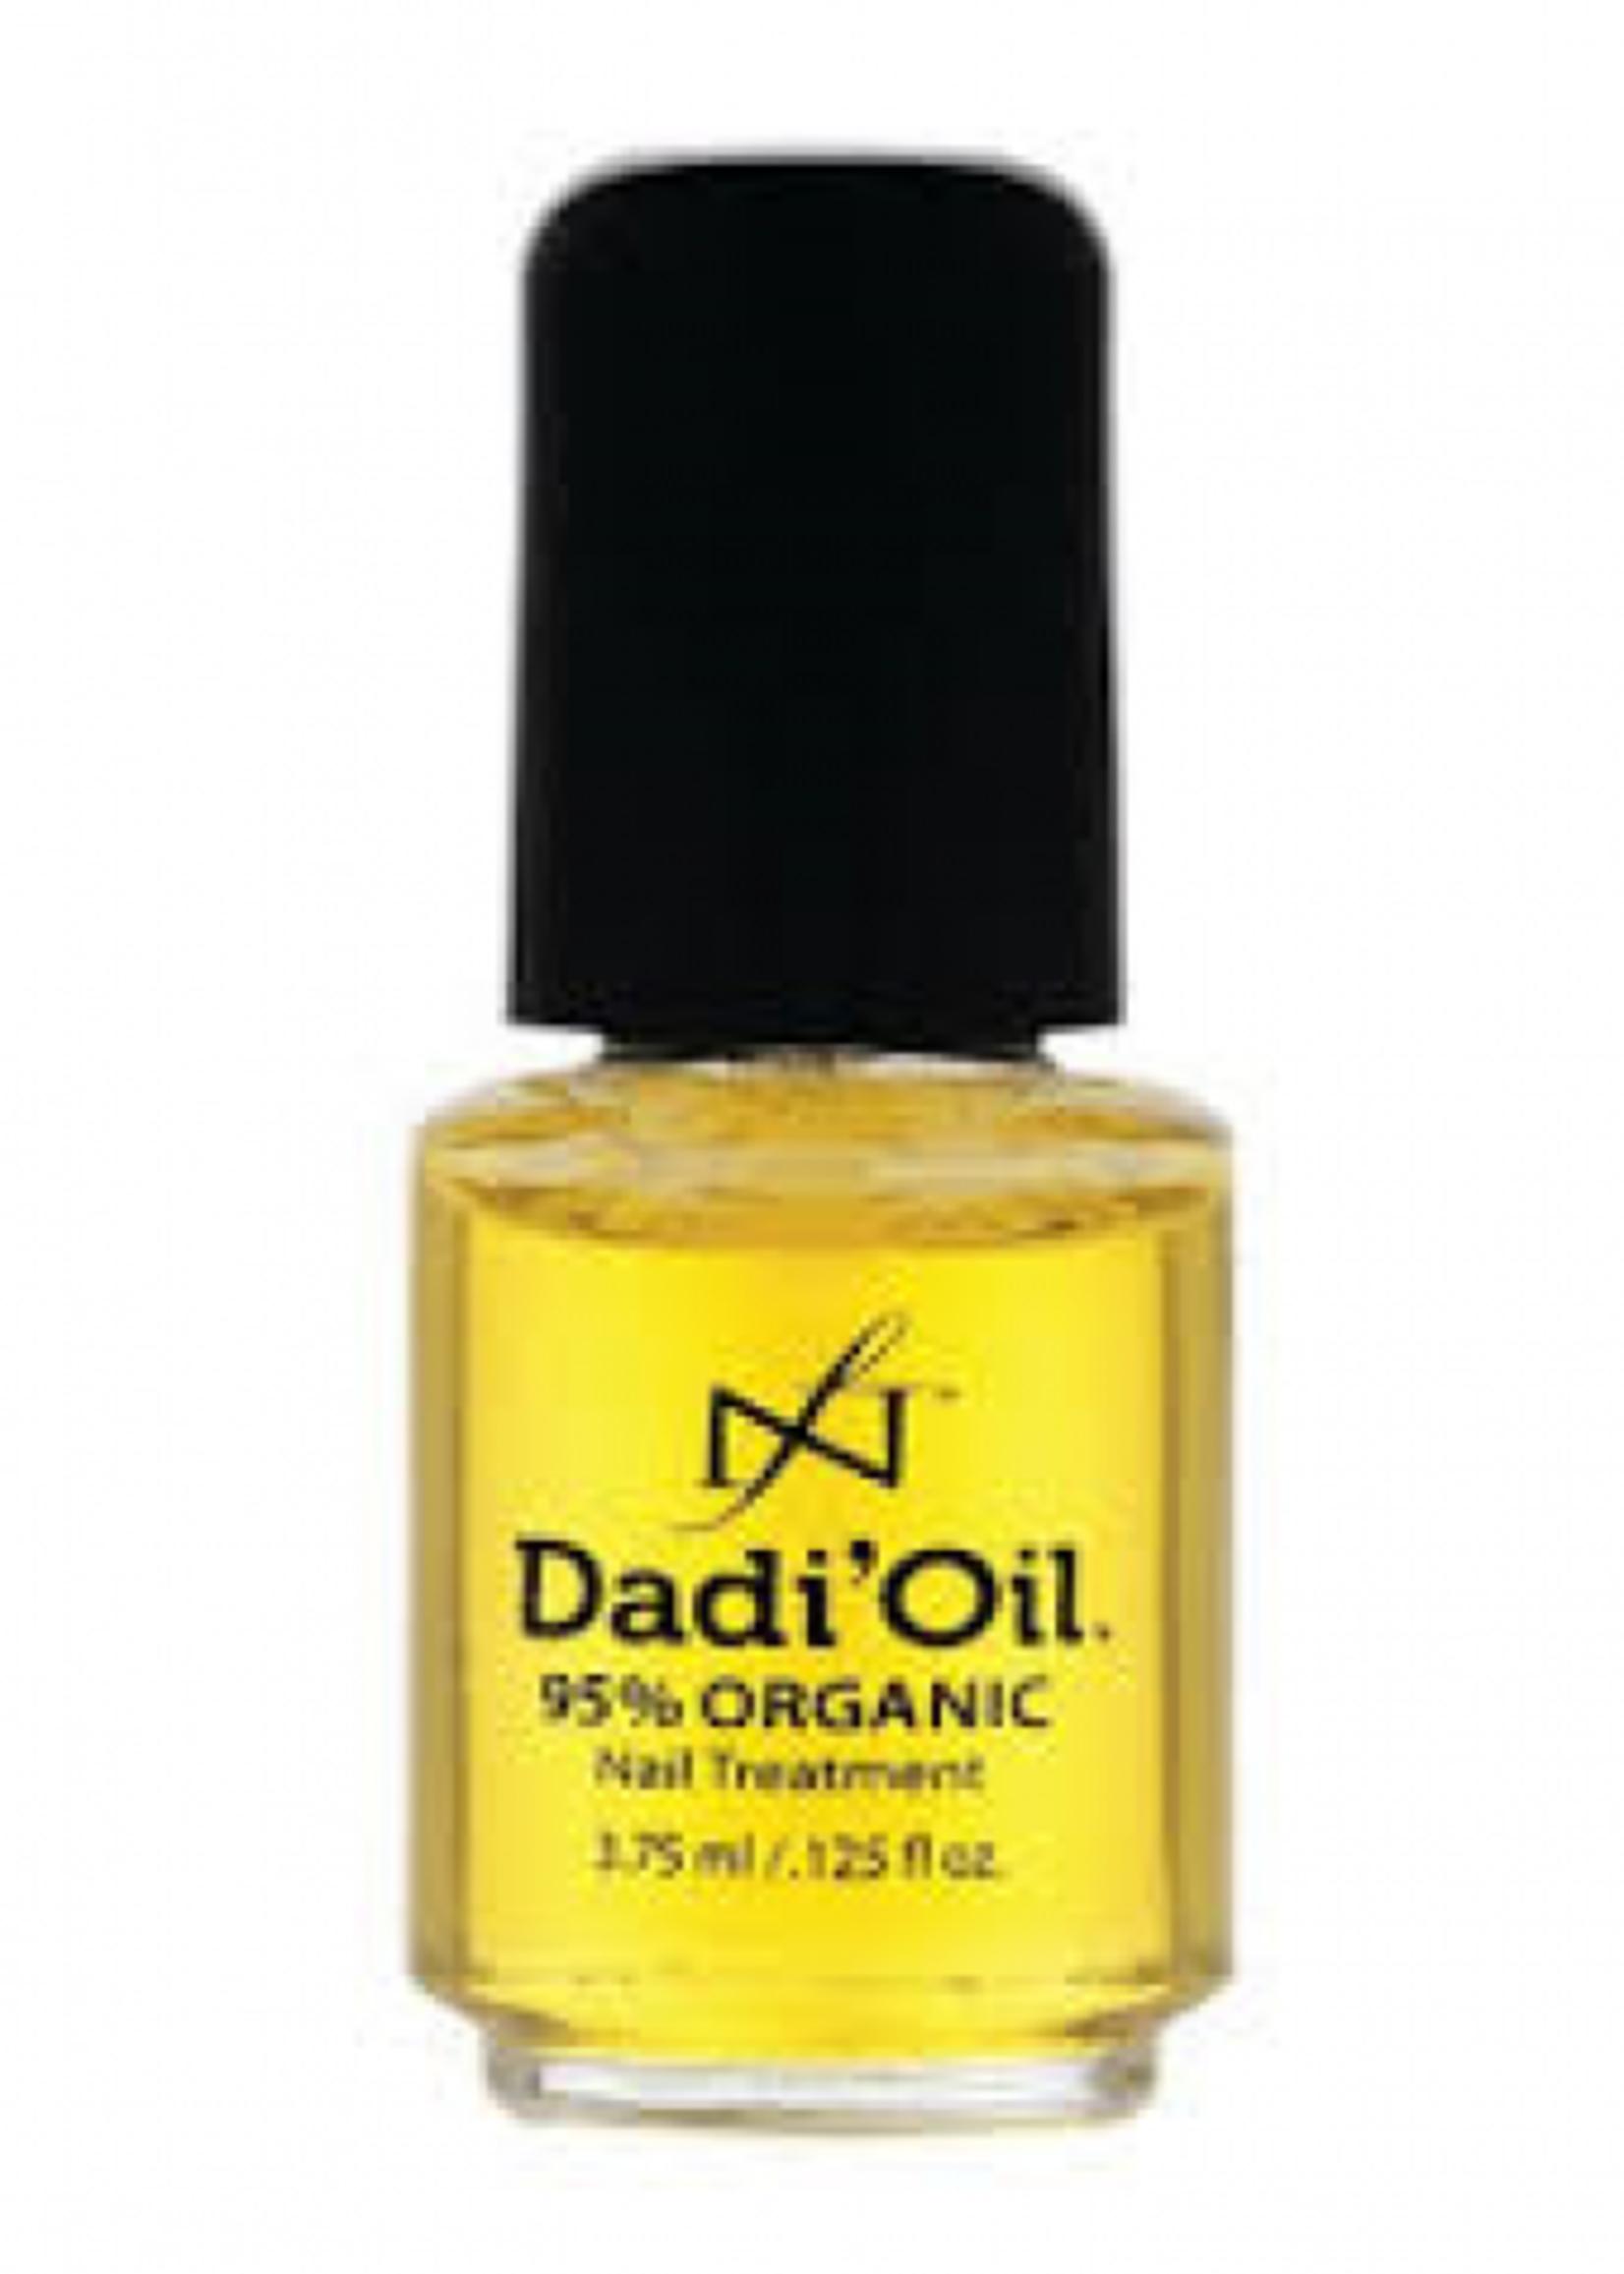 Dadi Oil Dadi Oil